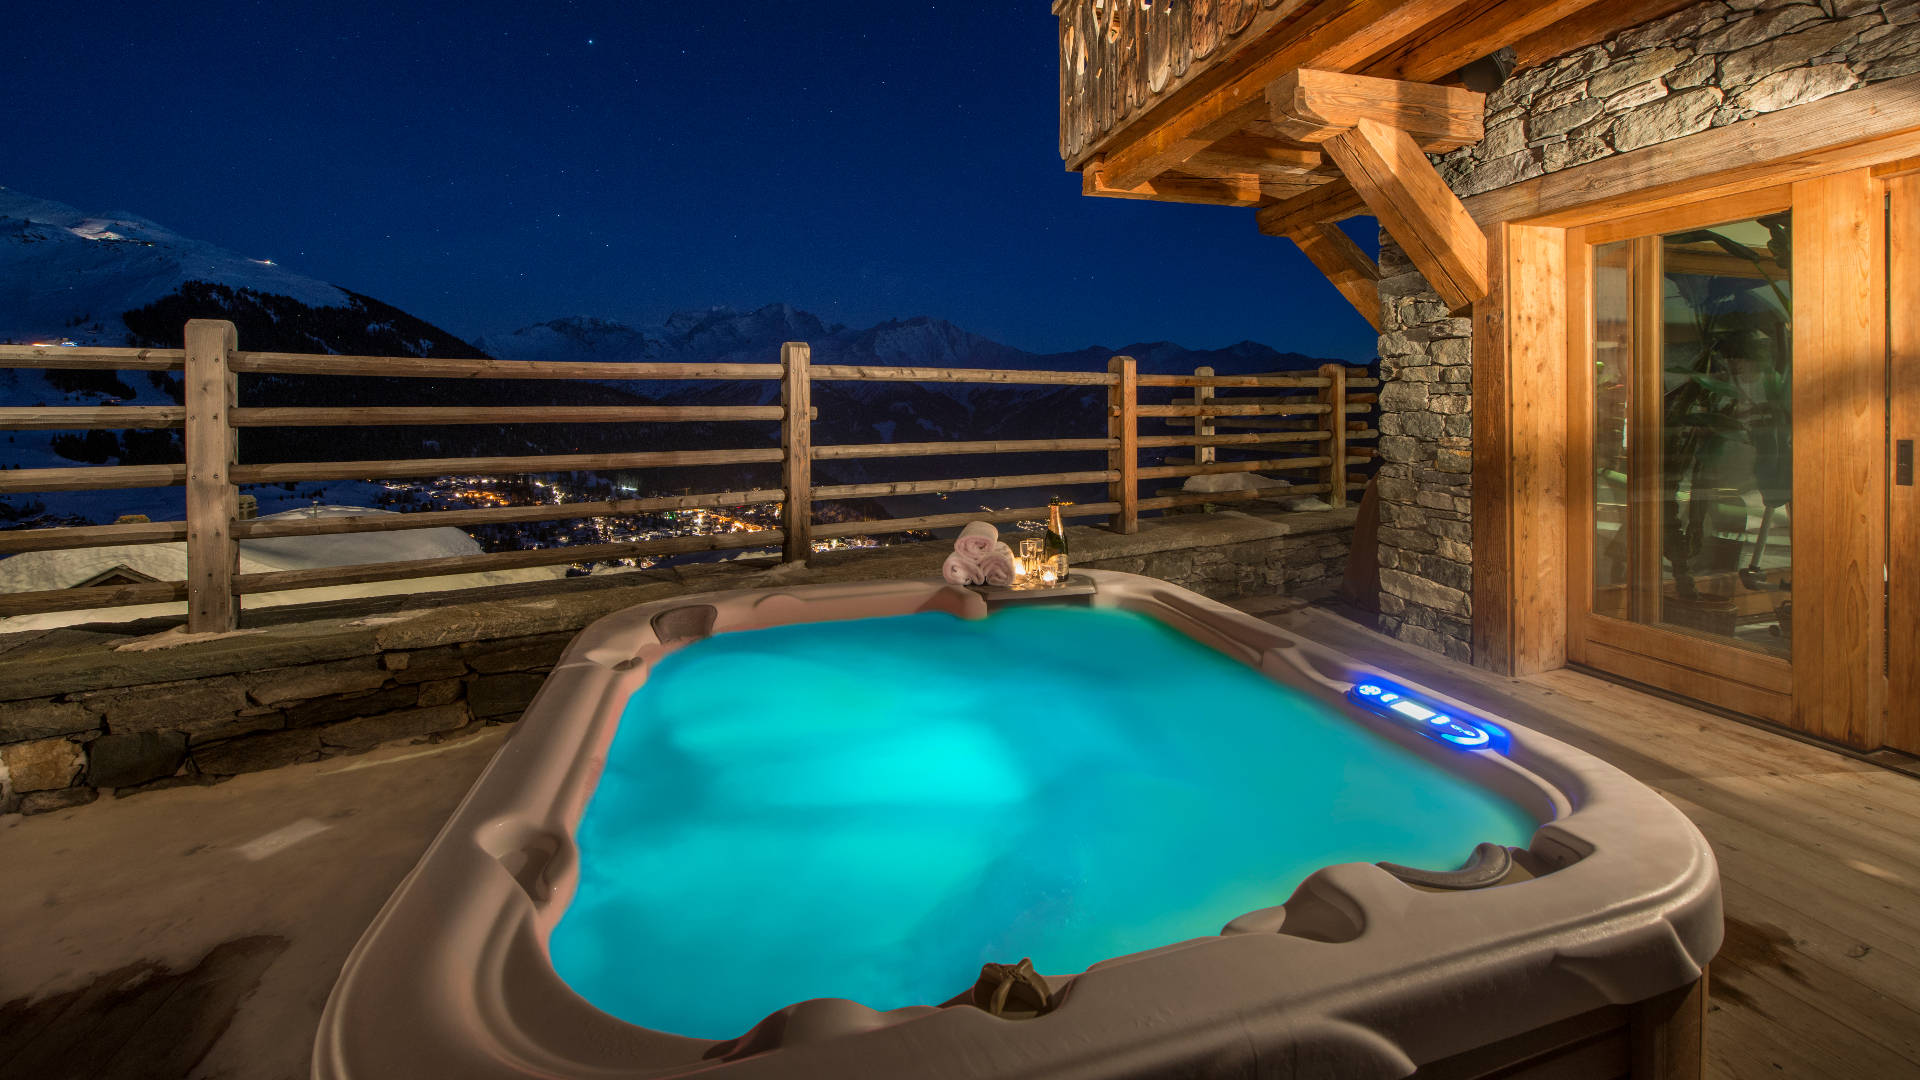 chalet-nyumba-outdoor-hot-tub-2